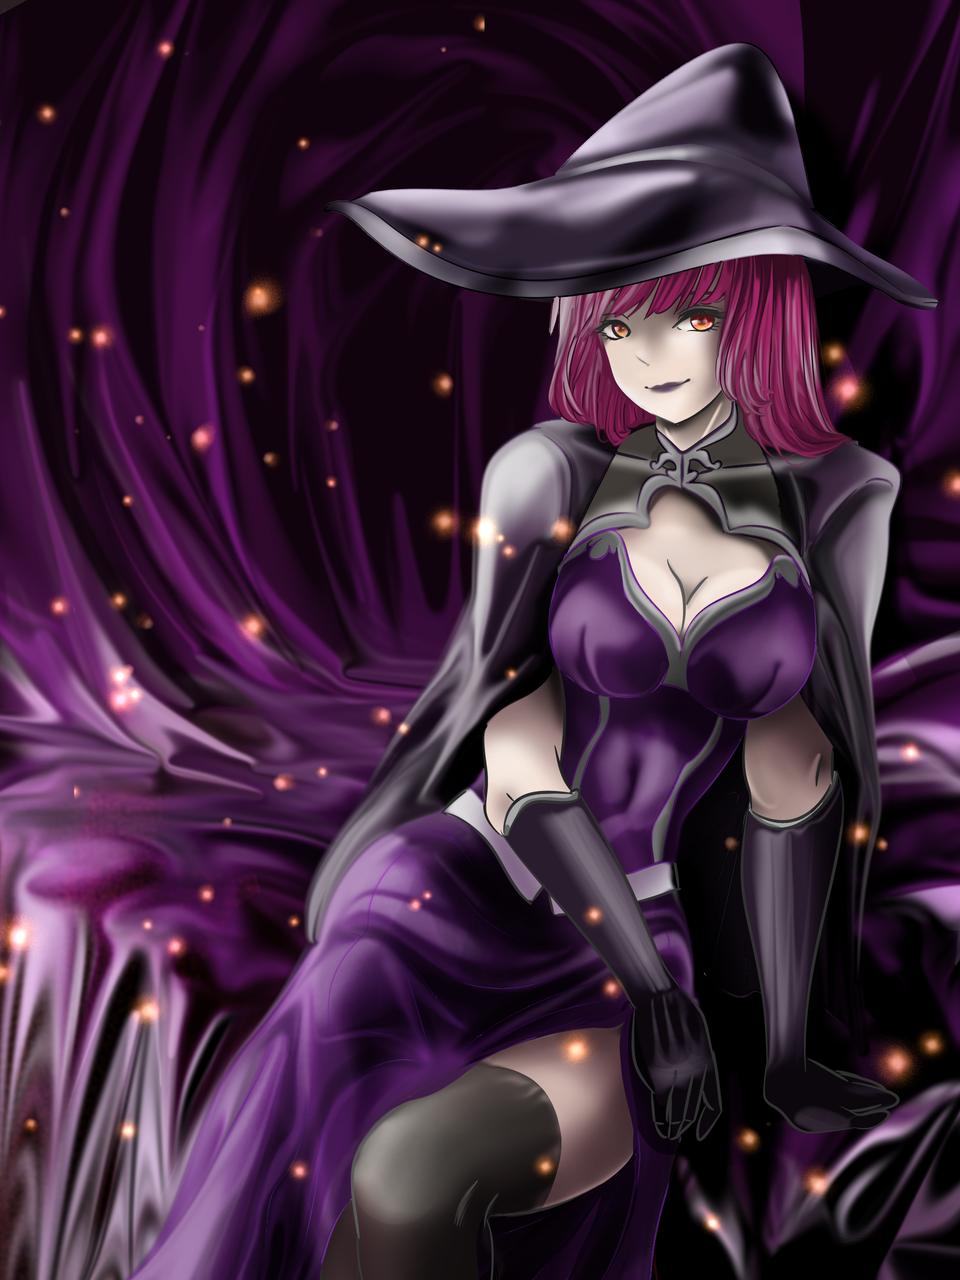 Halloween witch Illust of Akira Luca Oct.2019Contest